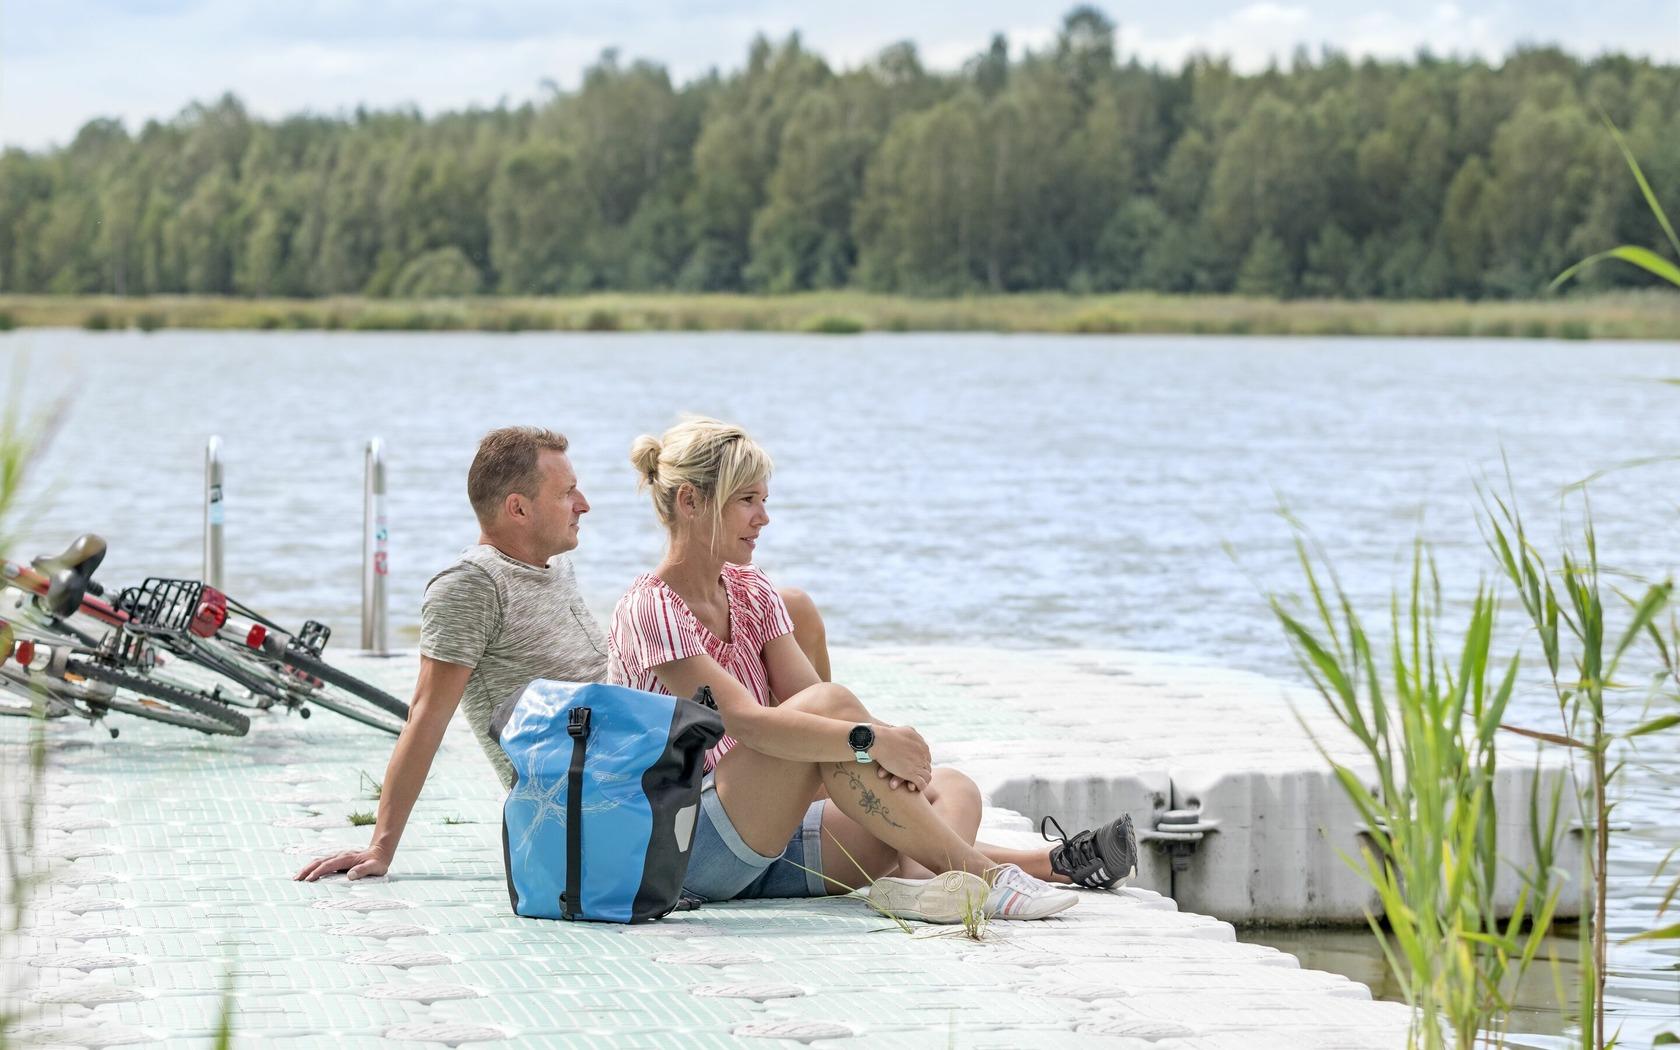 Radfahrer am Pastlingsee, Foto: Nada Quenzel, Lizenz: Tourismusverband Lausitzer Seenland e.V.